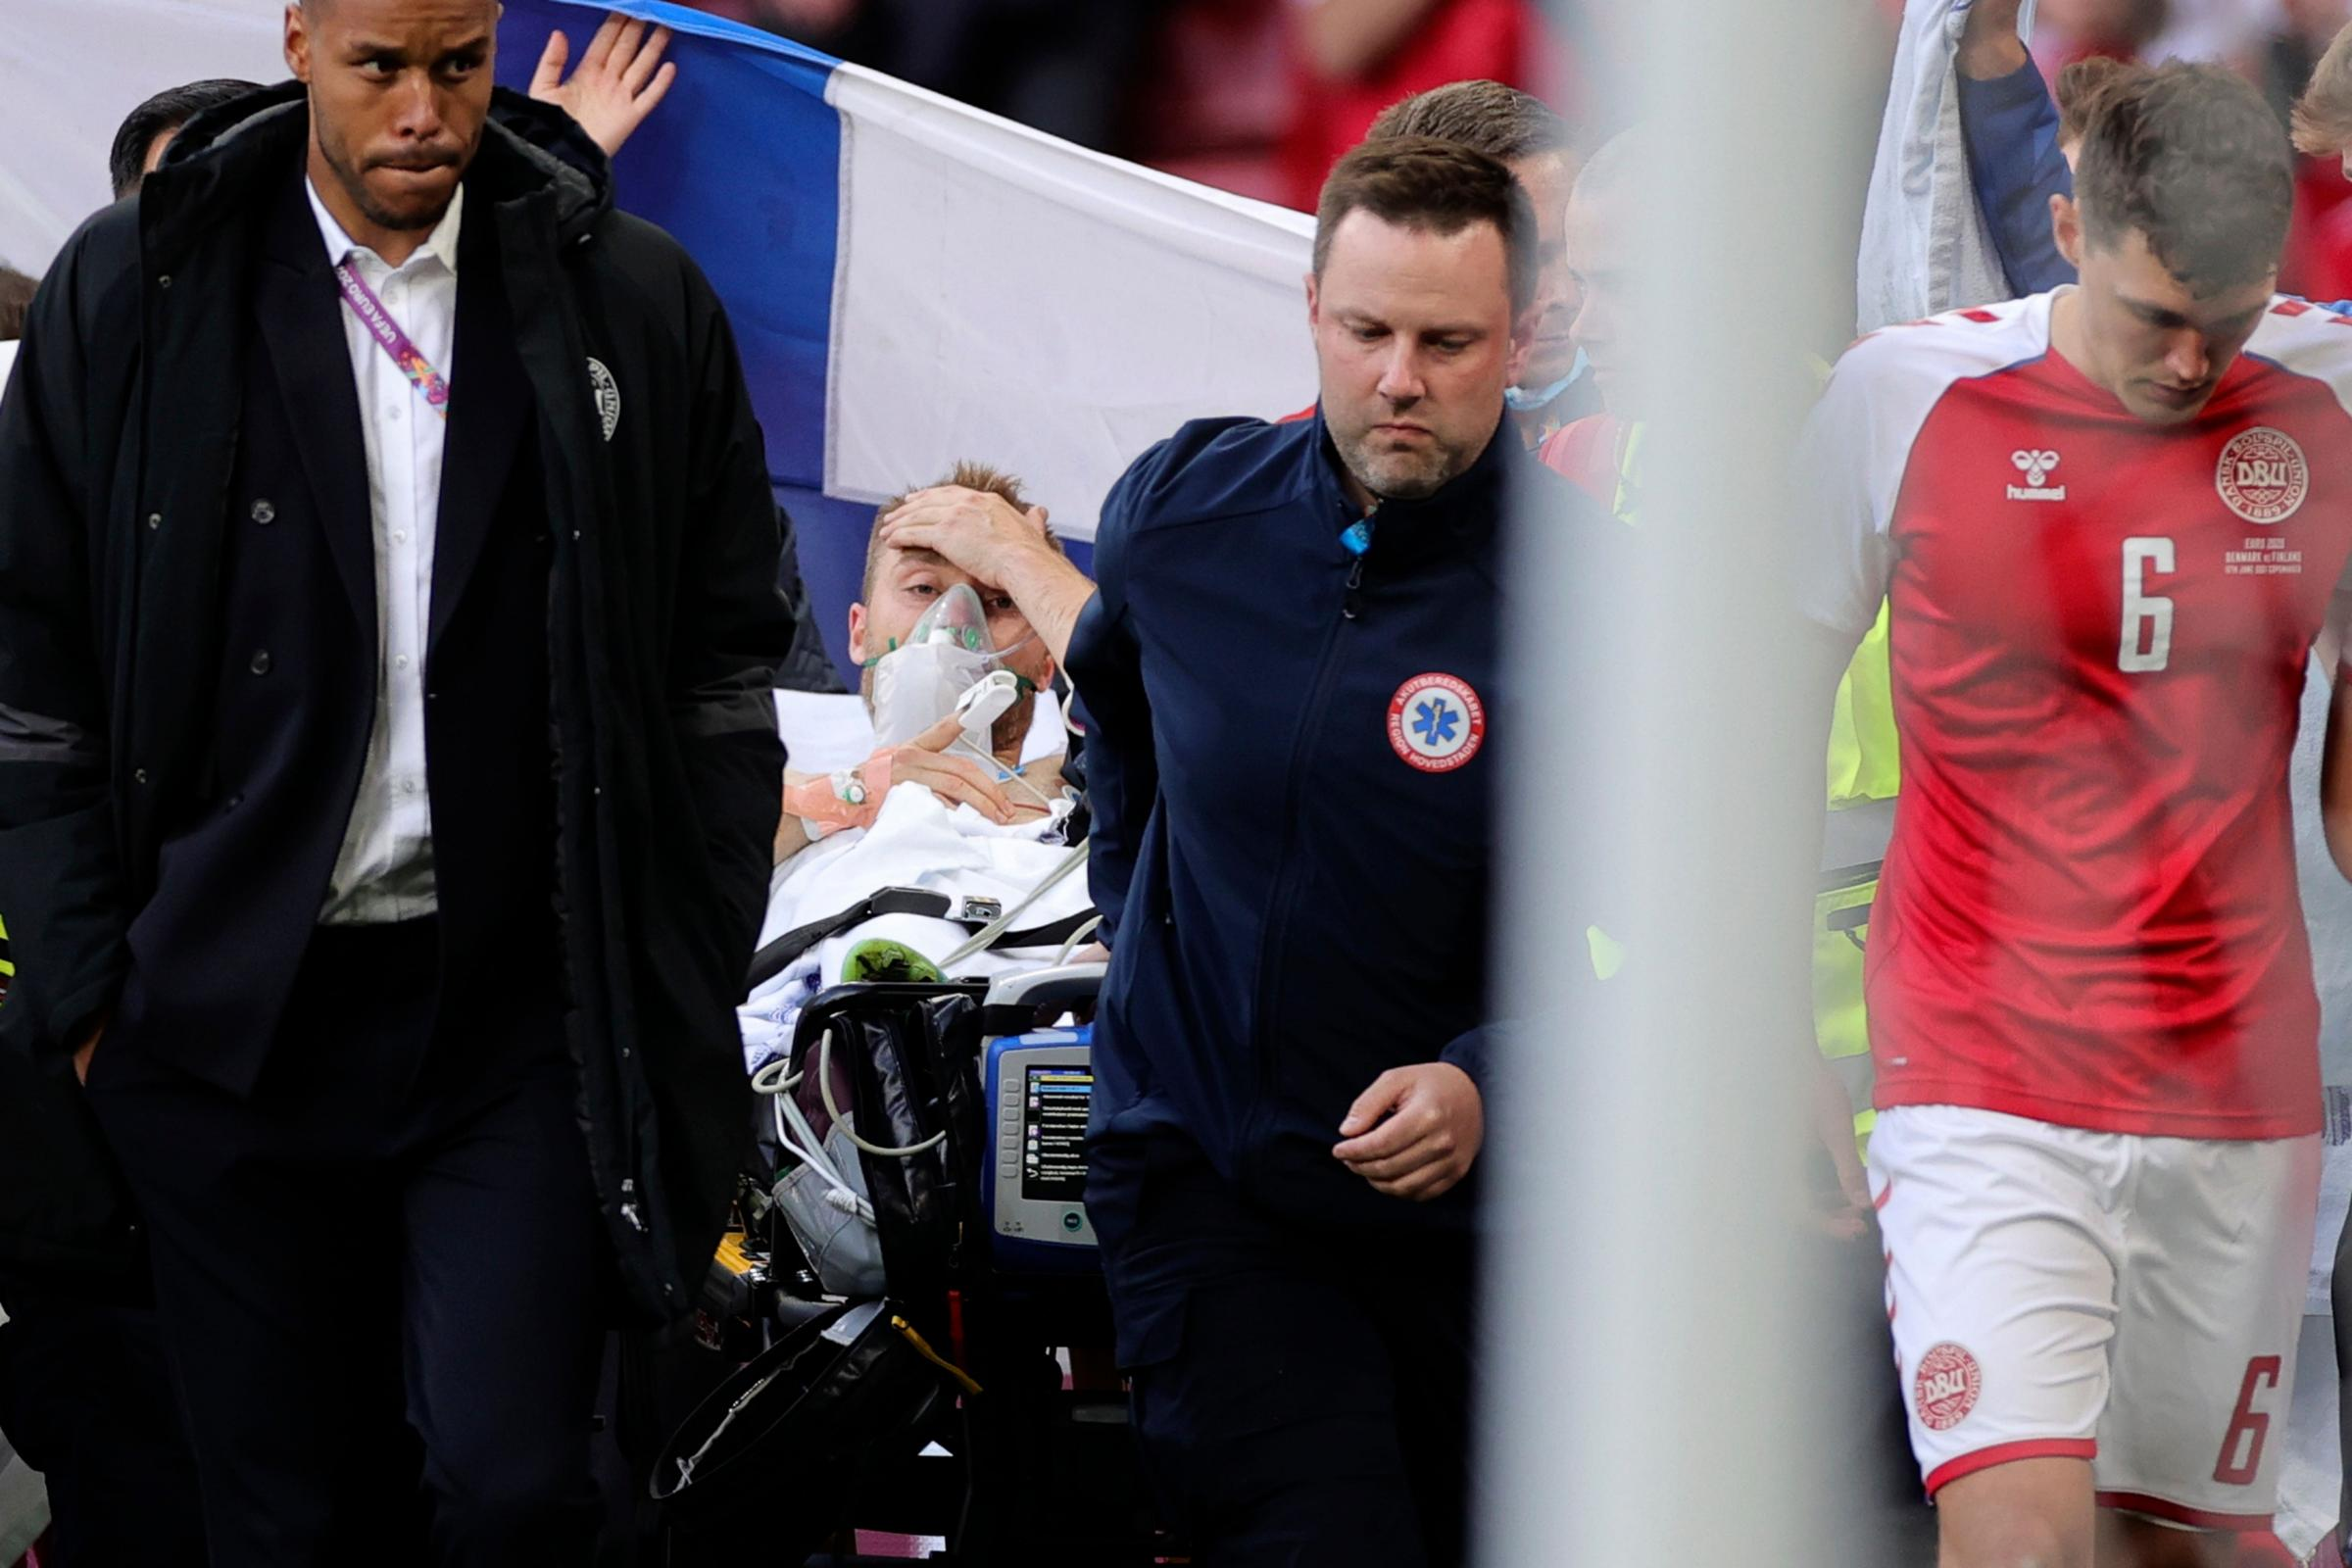 Football world unites around Christian Eriksen | The Westmorland Gazette